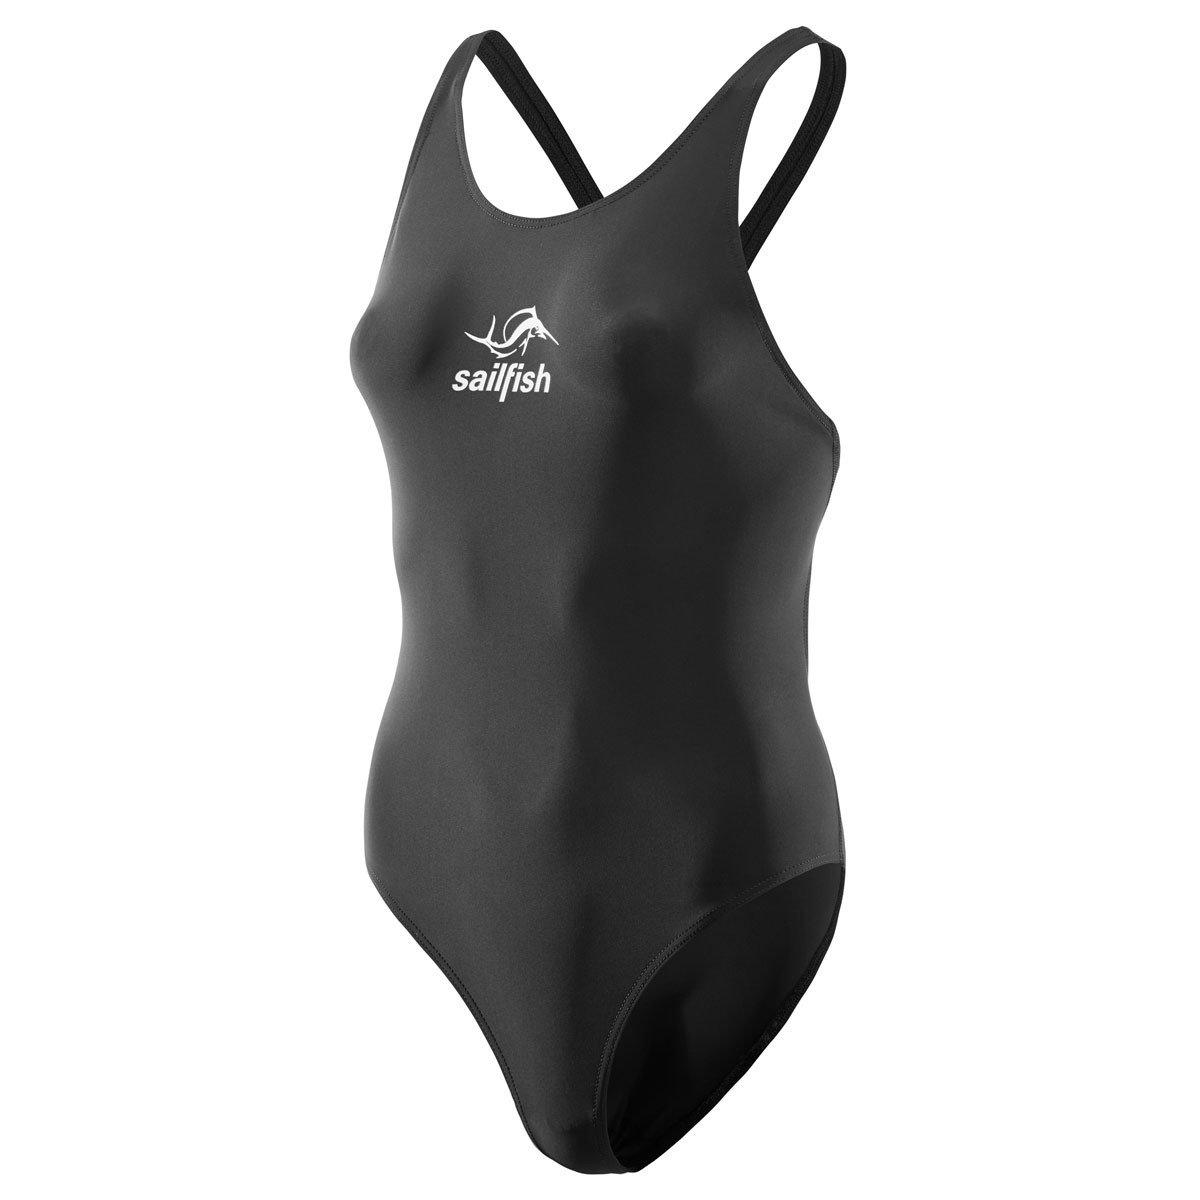 Sailfish Womens Swimsuit Classic - Schwimmanzug Damen